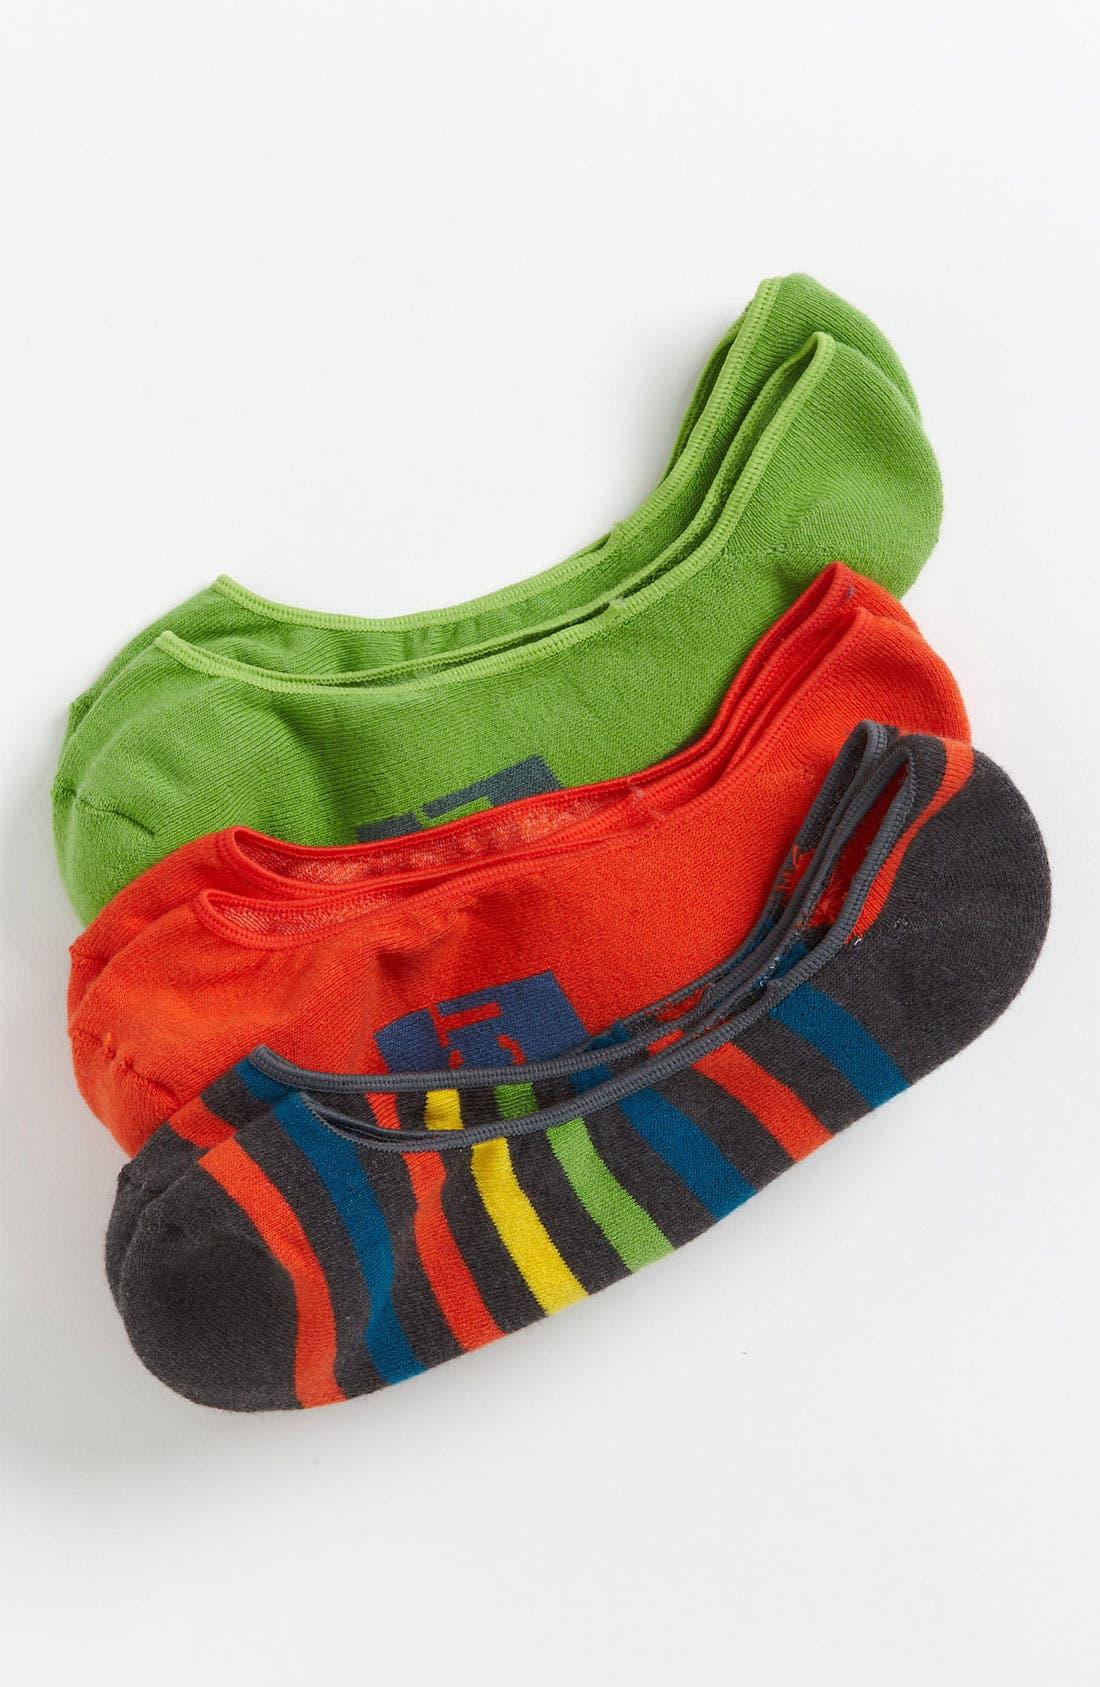 Alternate Image 1 Selected - Pact 'Farm' No-Show Socks (3-Pack) (Men)